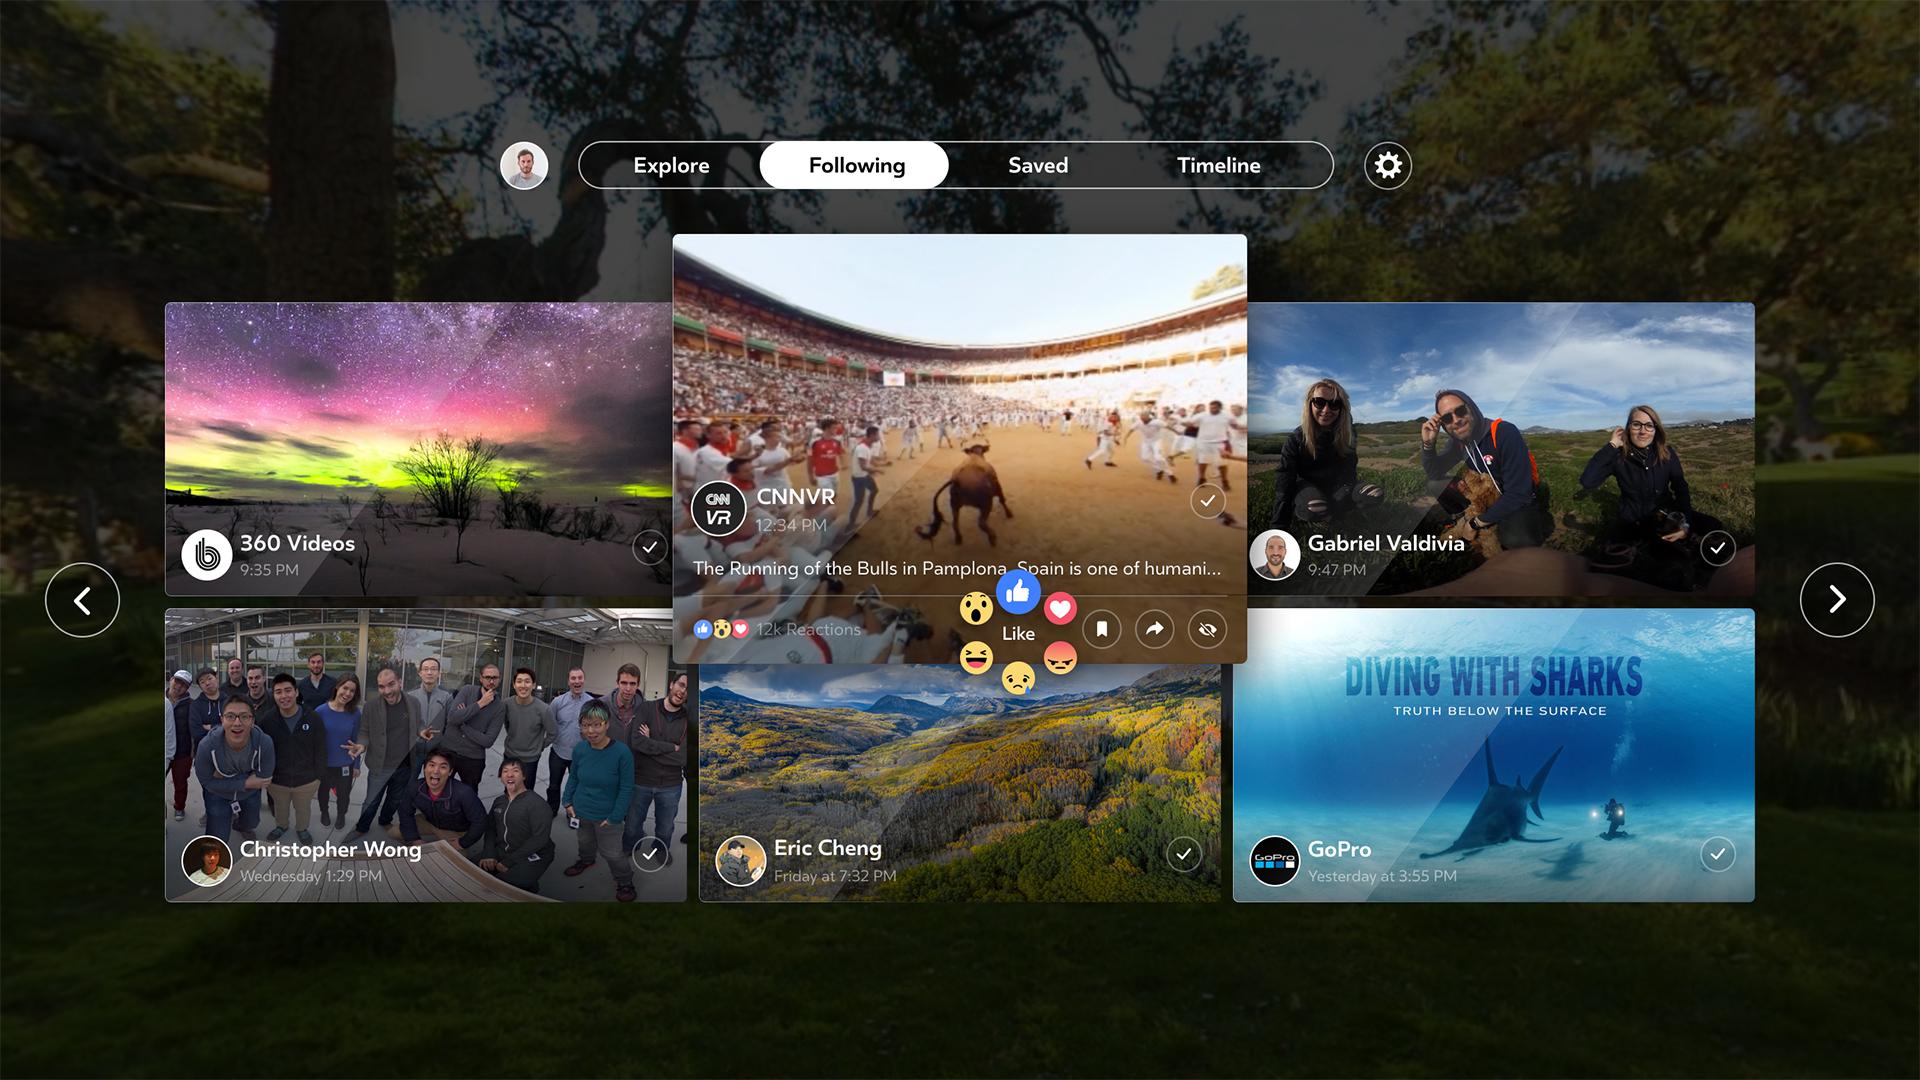 FacebookがサムソンのGear VR用アプリFacebook360を開発